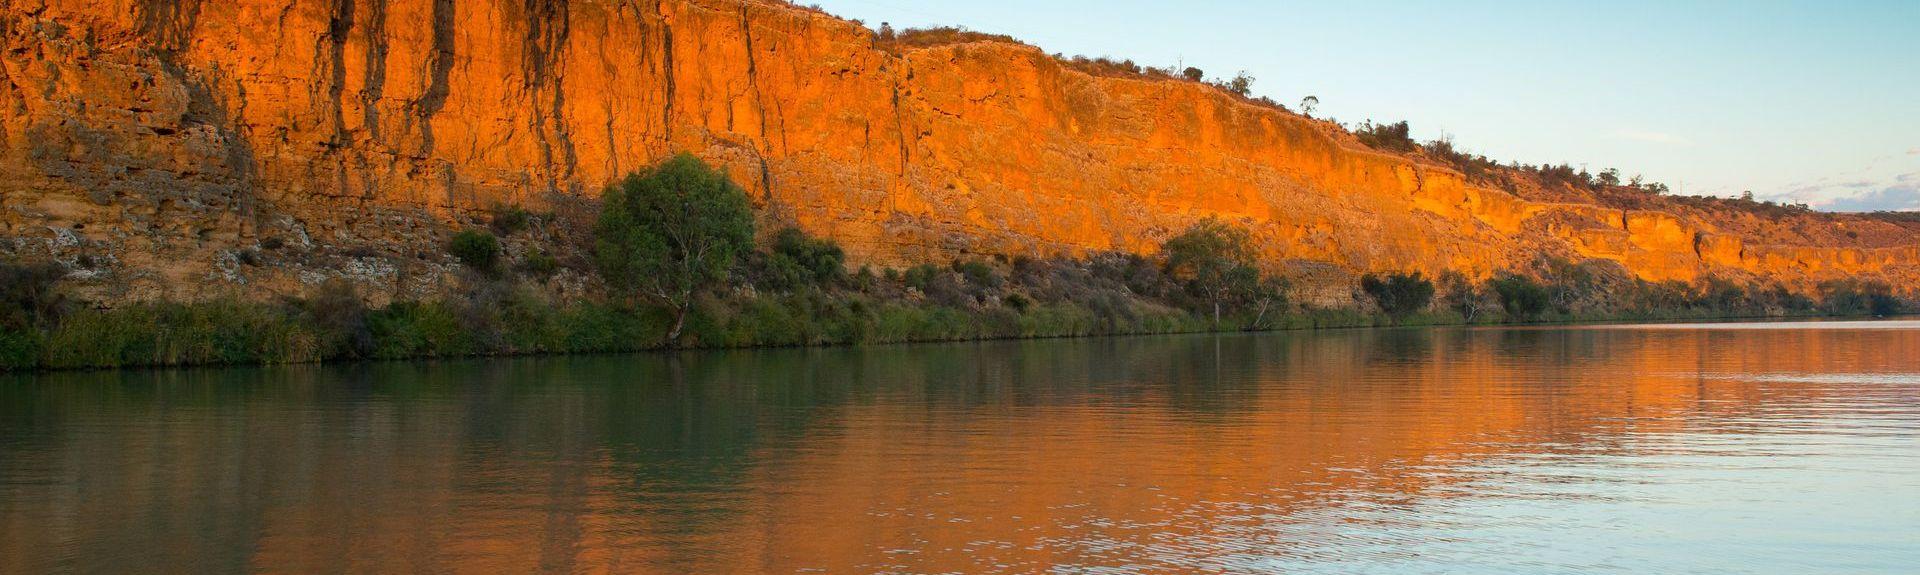 Murraylands, South Australia, Australia